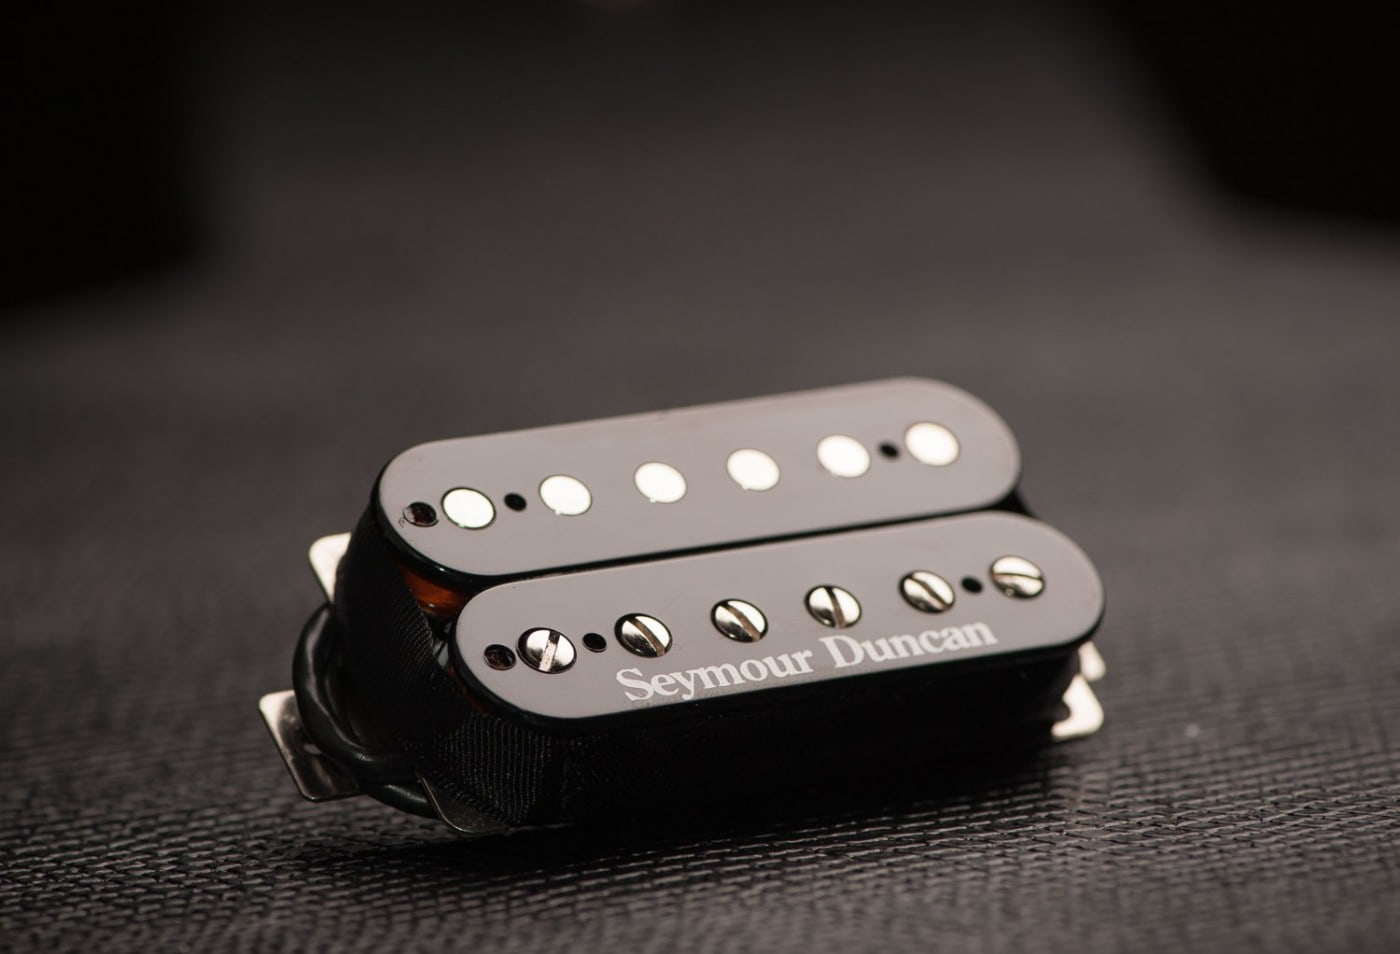 seymour duncan sh 11 custom custom bridge humbucker pickup black solo guitars. Black Bedroom Furniture Sets. Home Design Ideas